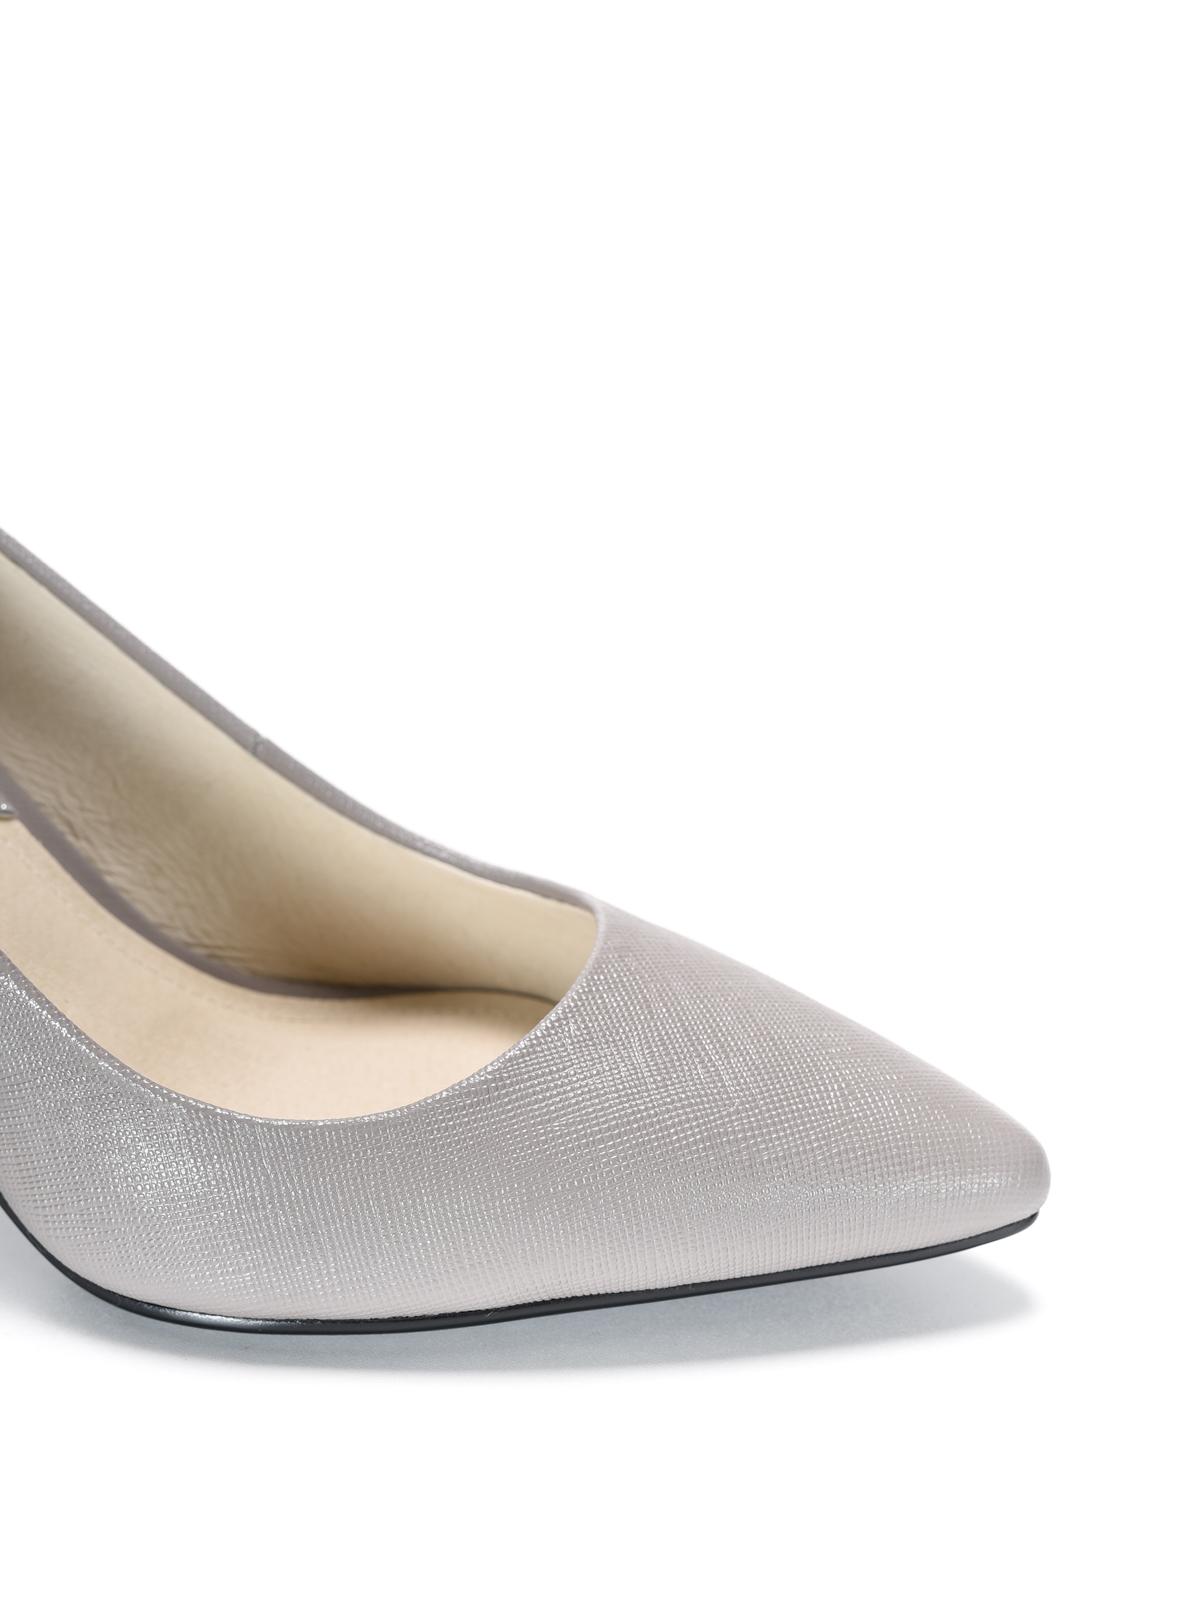 flex mid pumps by michael kors court shoes ikrix. Black Bedroom Furniture Sets. Home Design Ideas